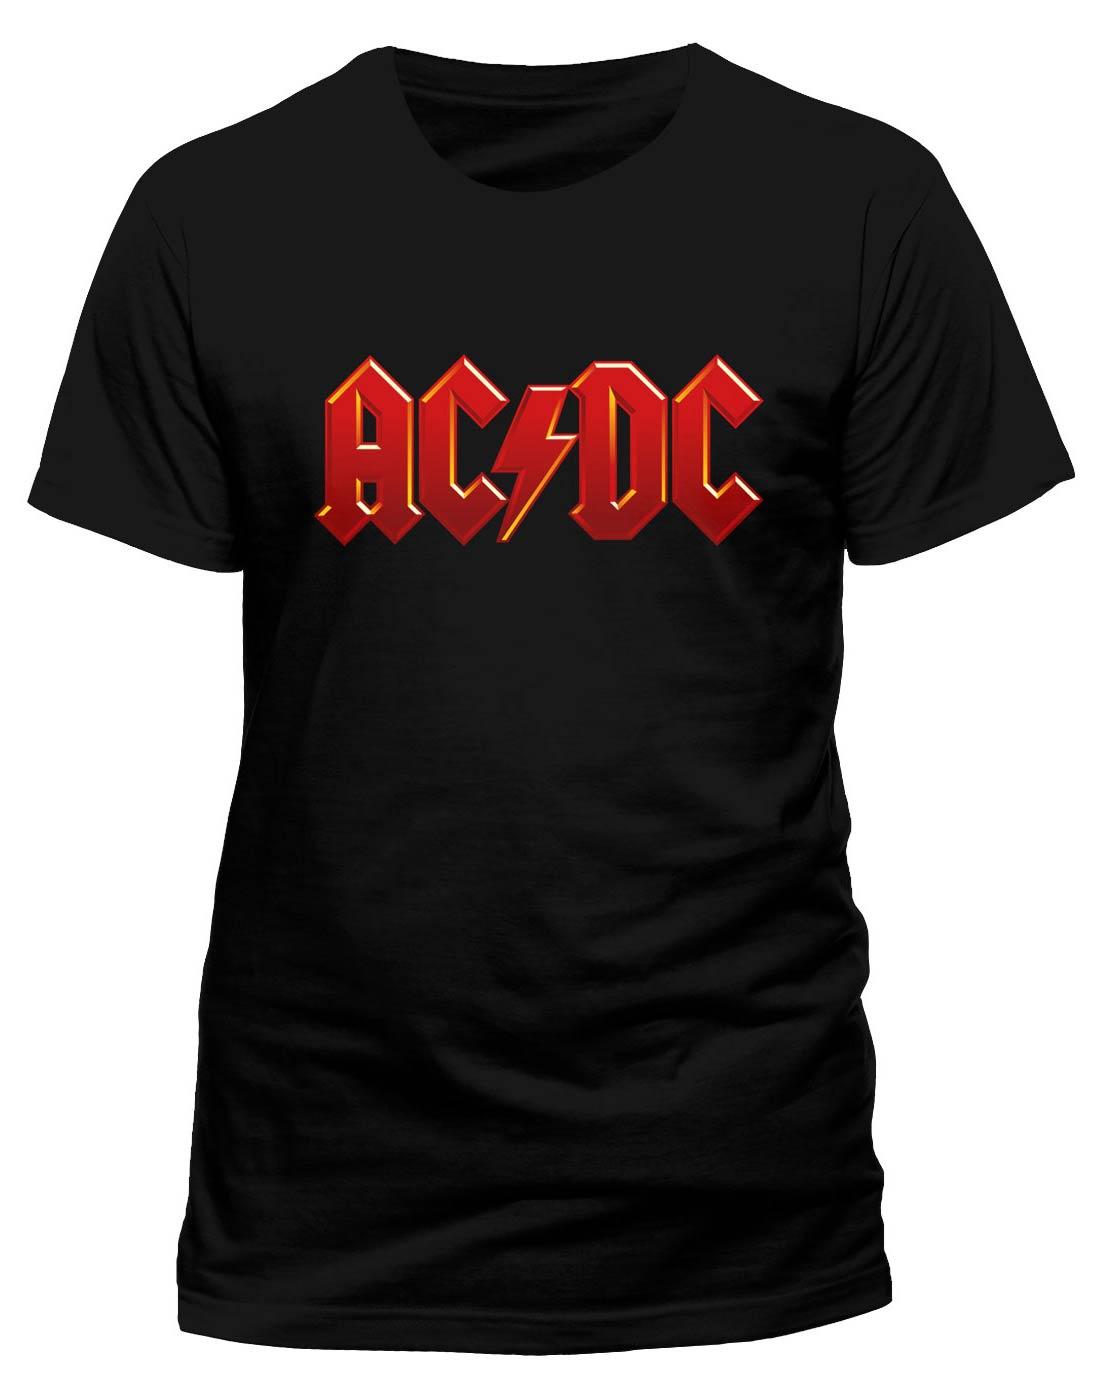 AC/DC - RED LOGO (T-SHIRT UNISEX TG. S)